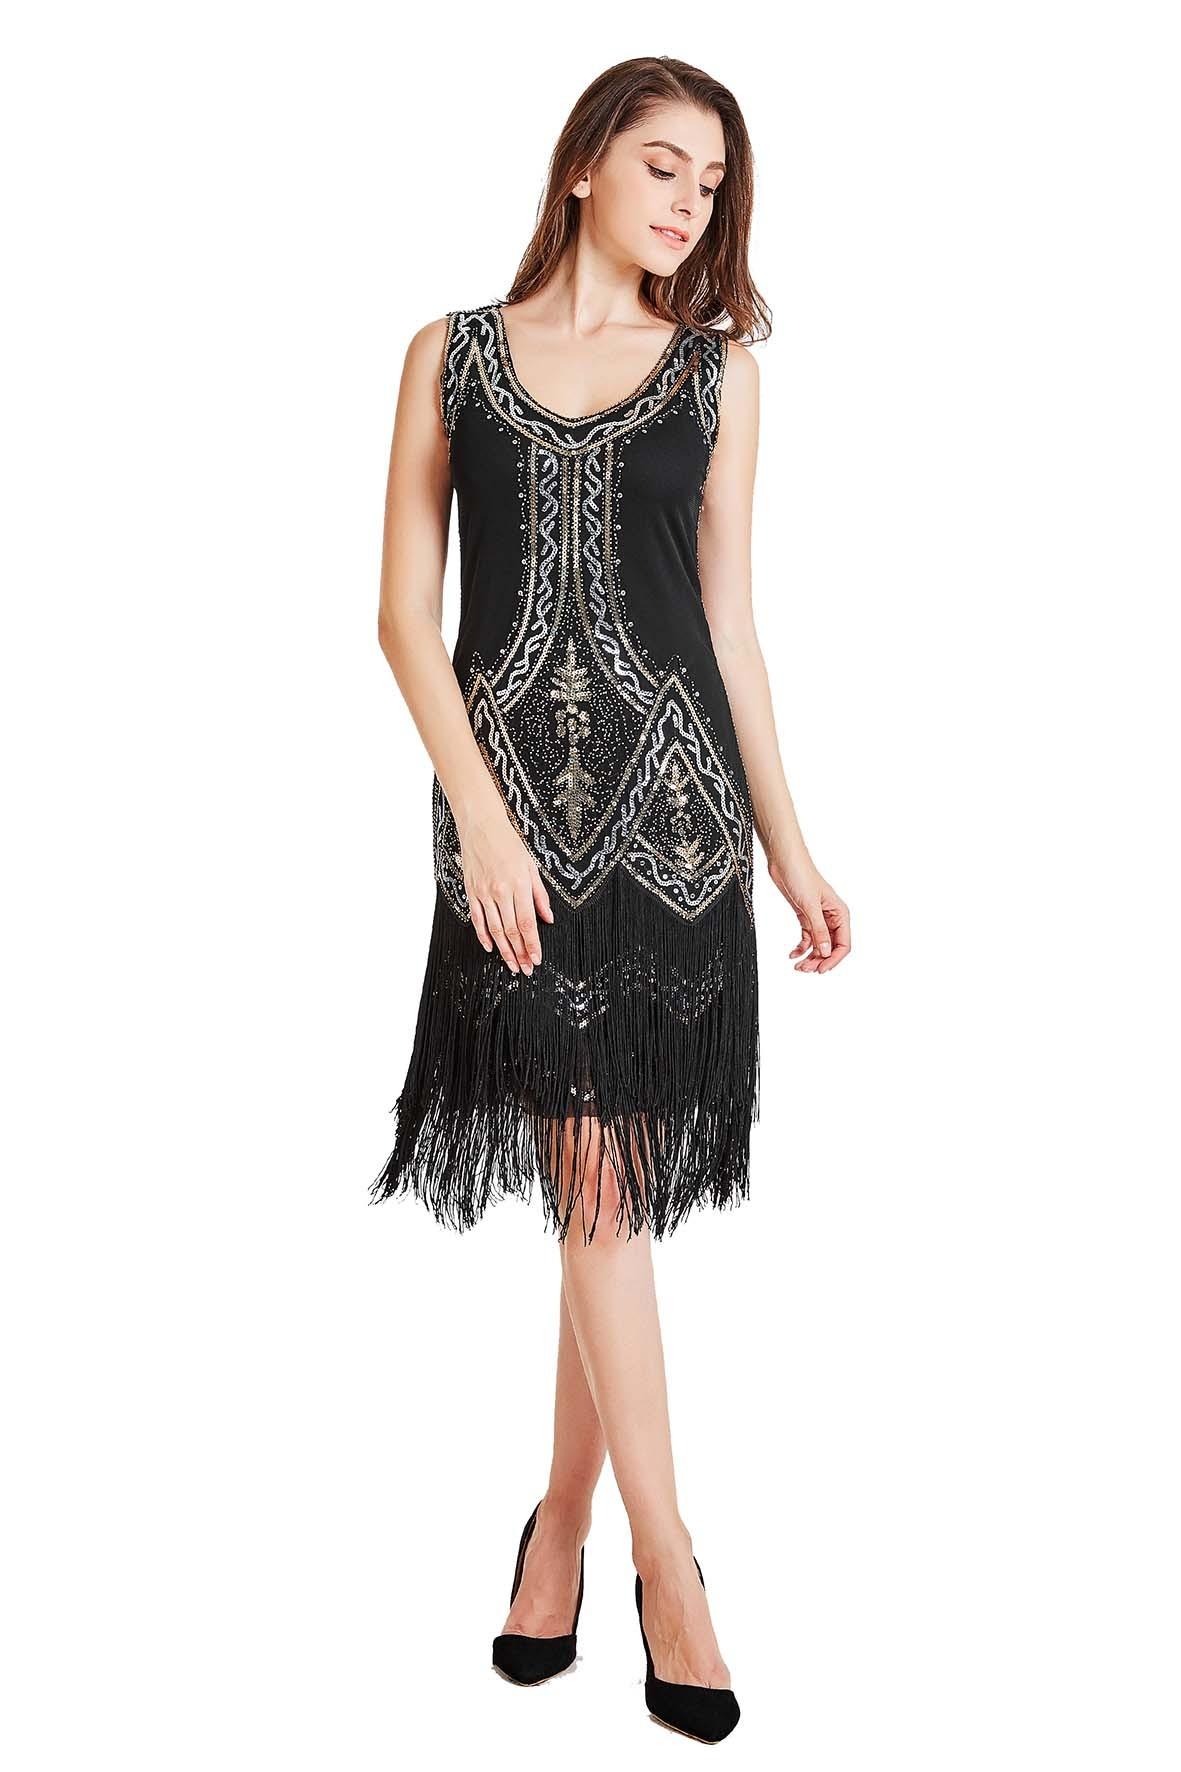 c60f9f37ad295 1920s Vintage Great Gatsby Charleston 20s Flapper Fancy Dress gatsby  gangster ladies